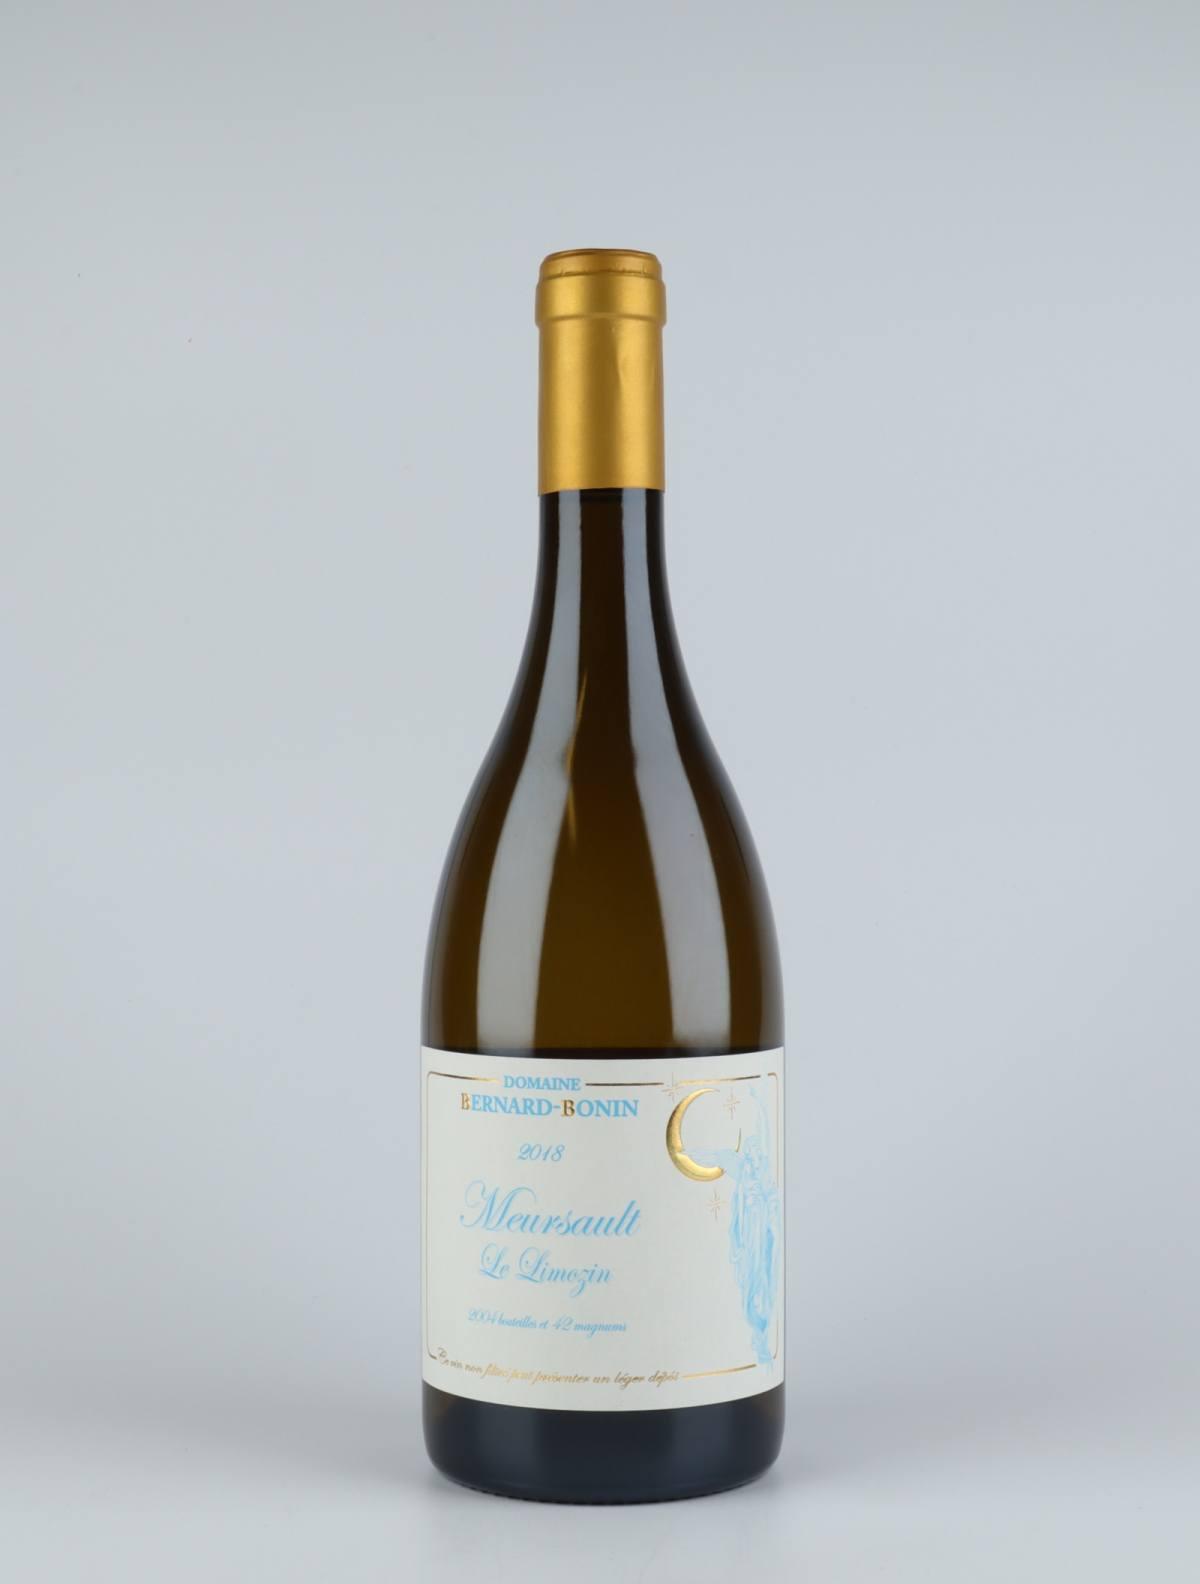 Meursault - Limozin